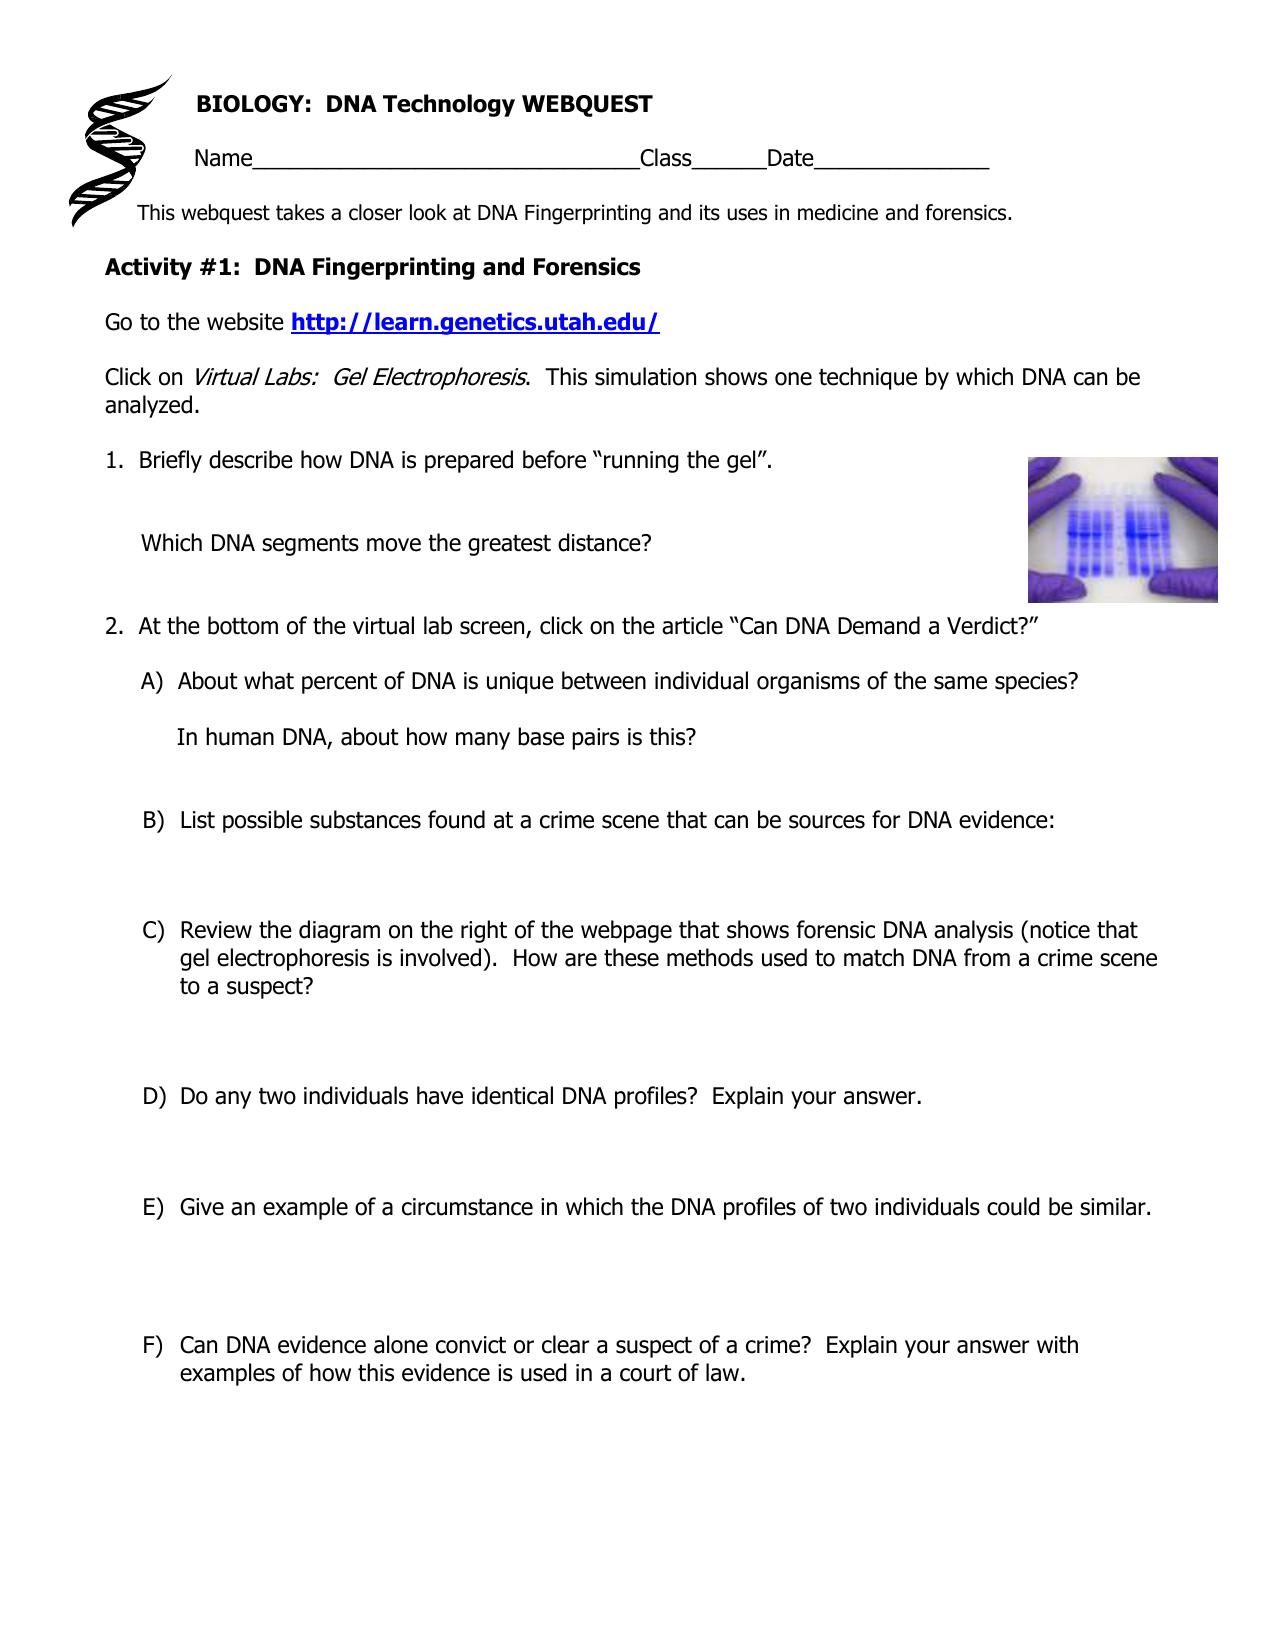 biology dna webquest answer key